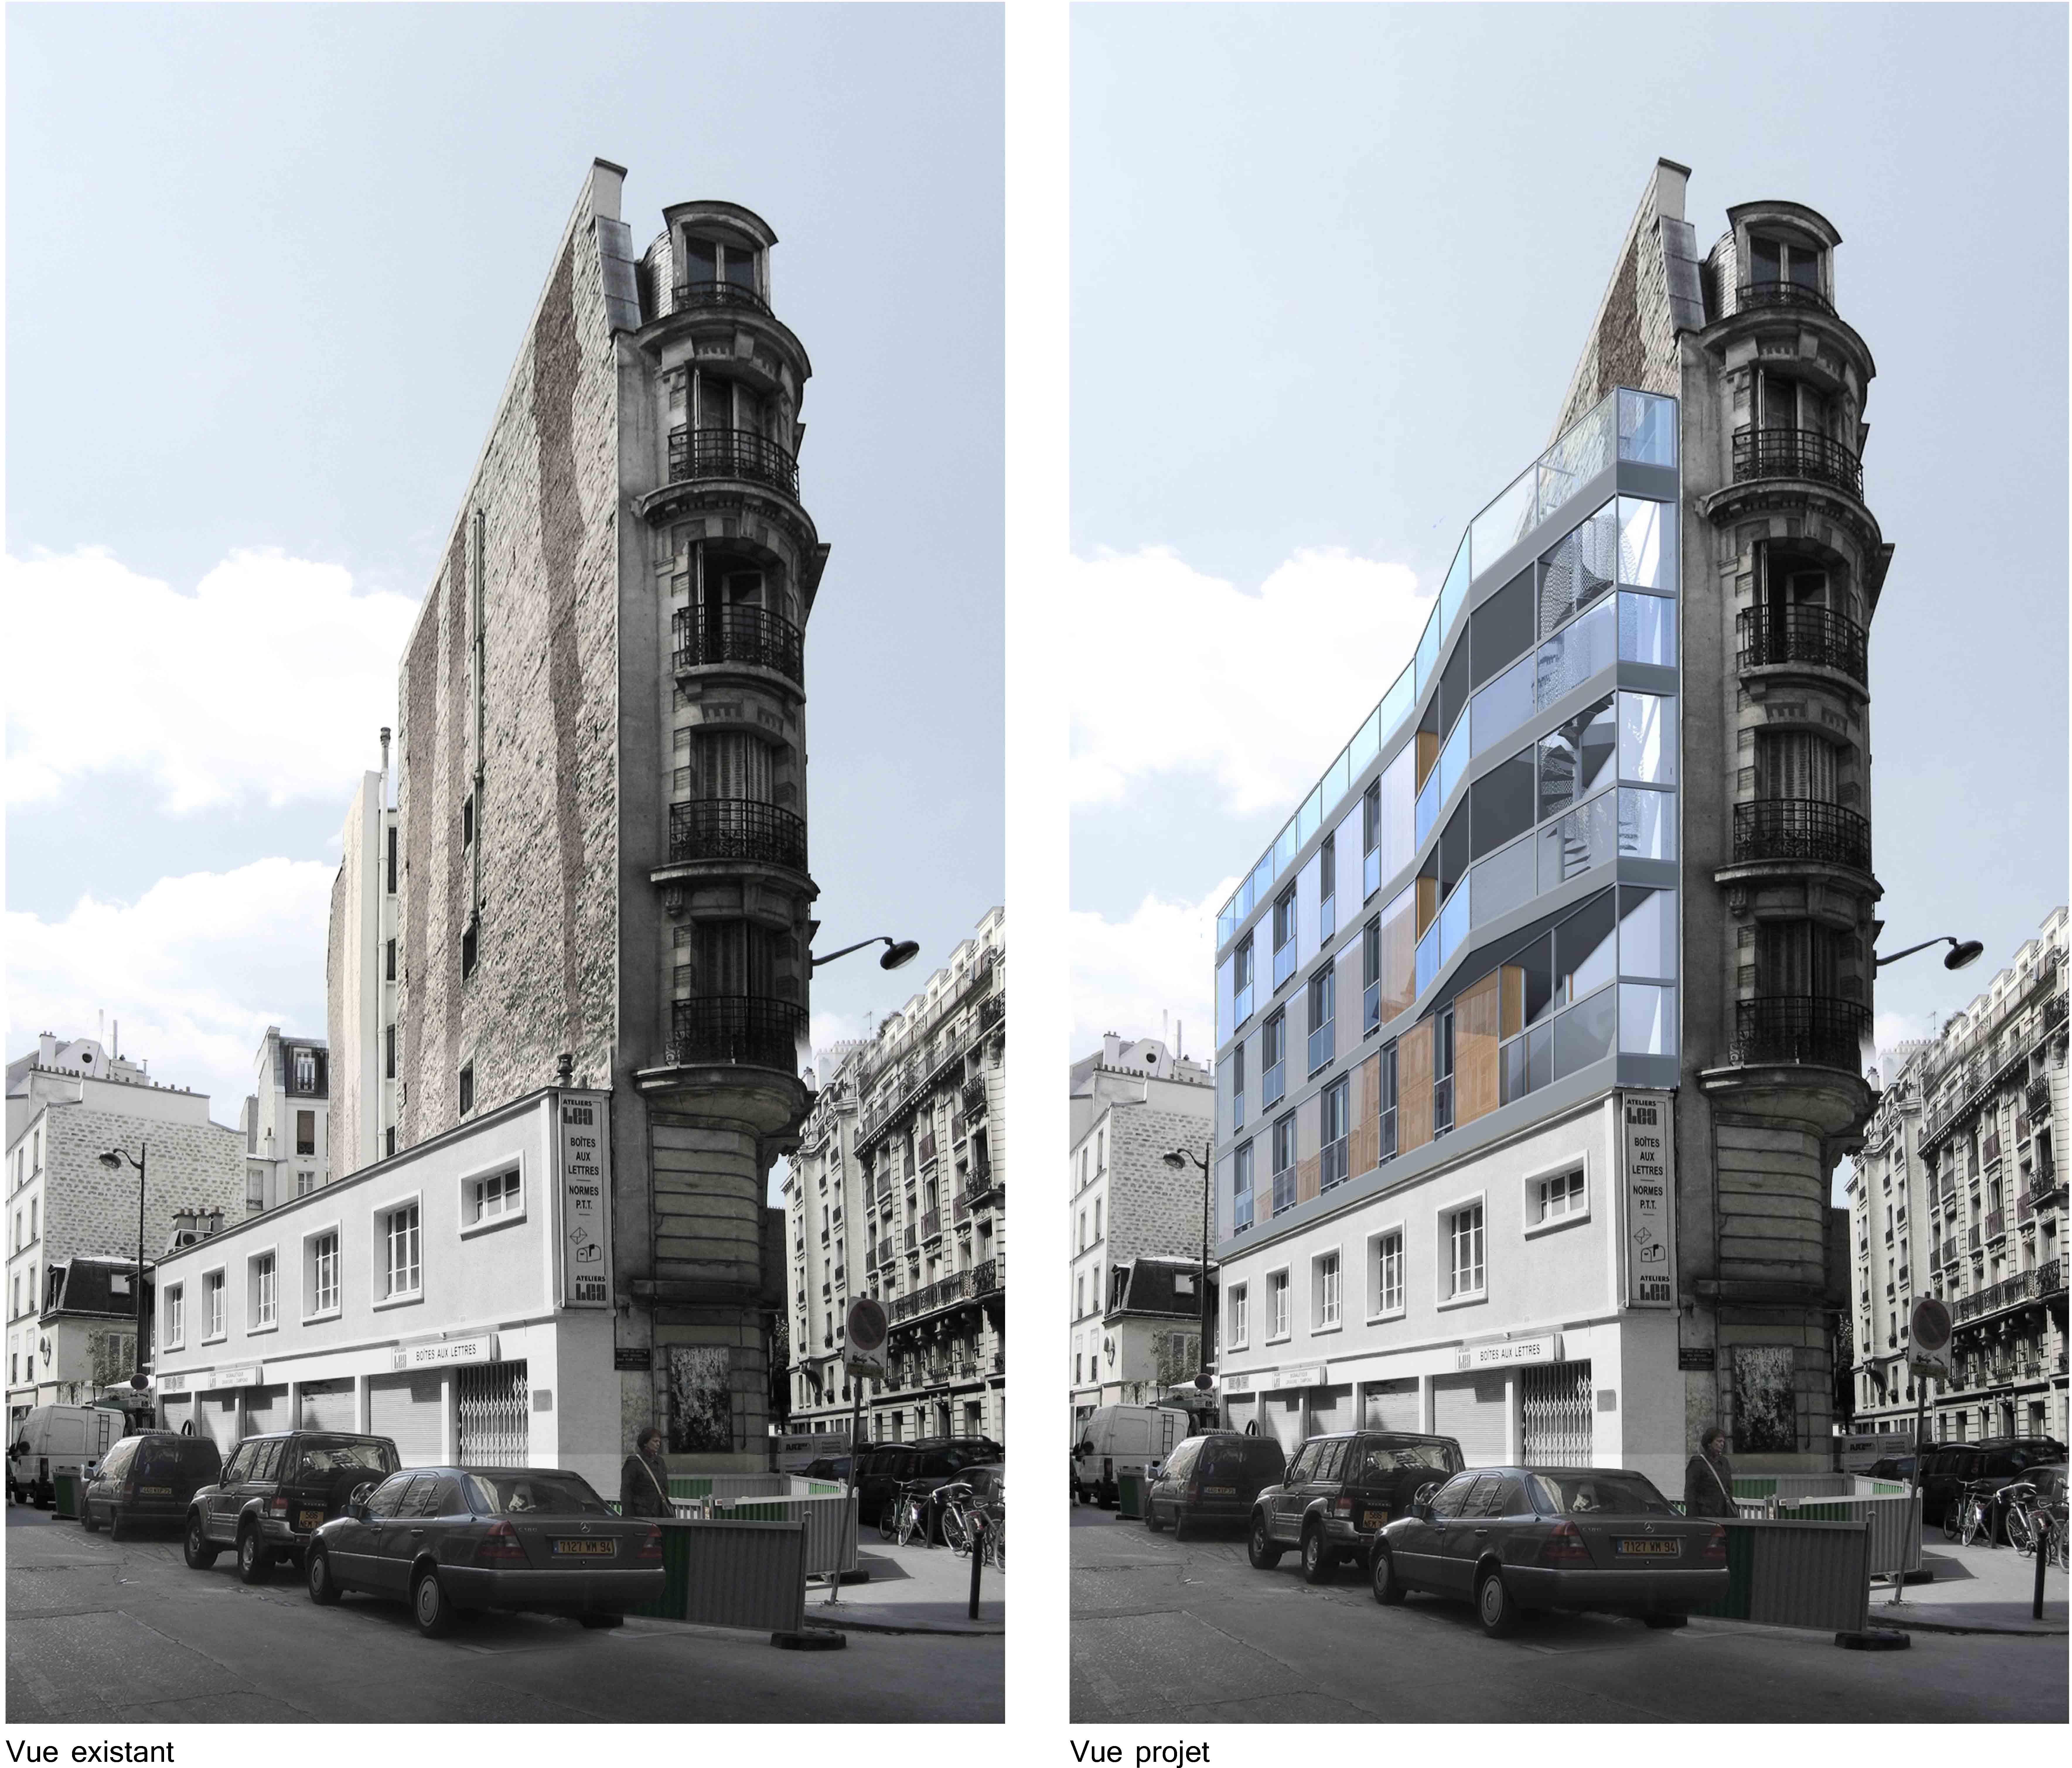 sur l vation i rue de la sabli re i paris 14 zoomfactor architectes paris. Black Bedroom Furniture Sets. Home Design Ideas